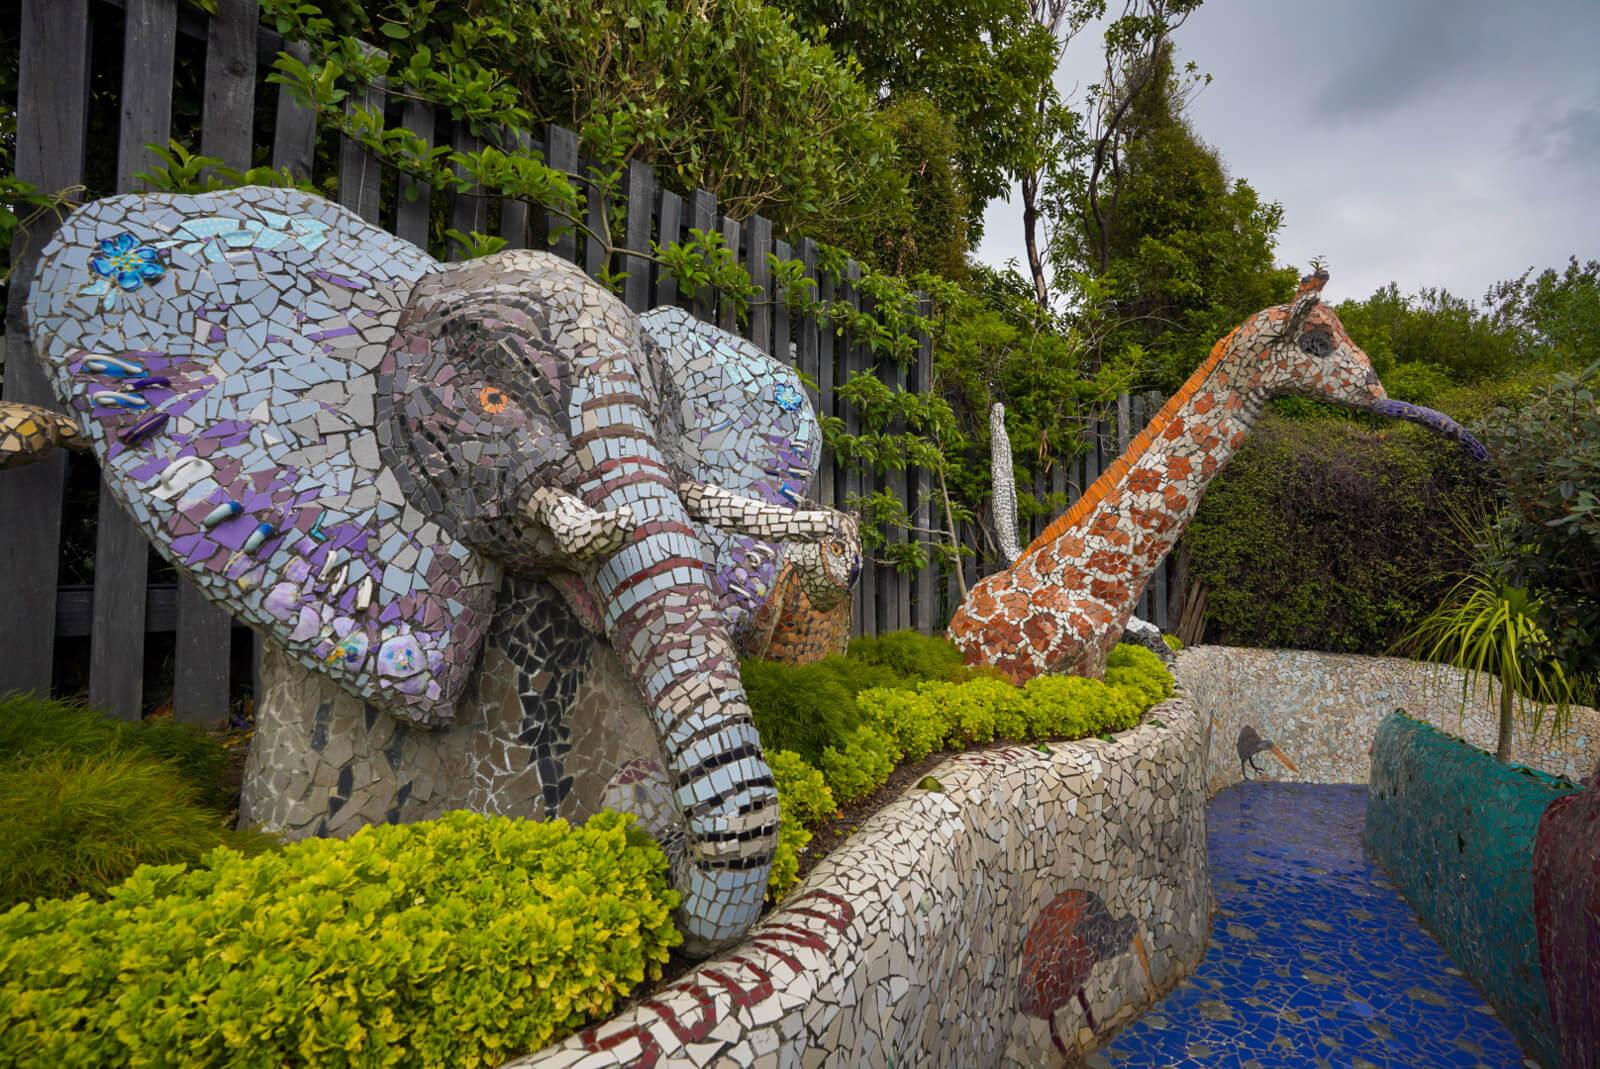 Giant's House Garden Mosaics